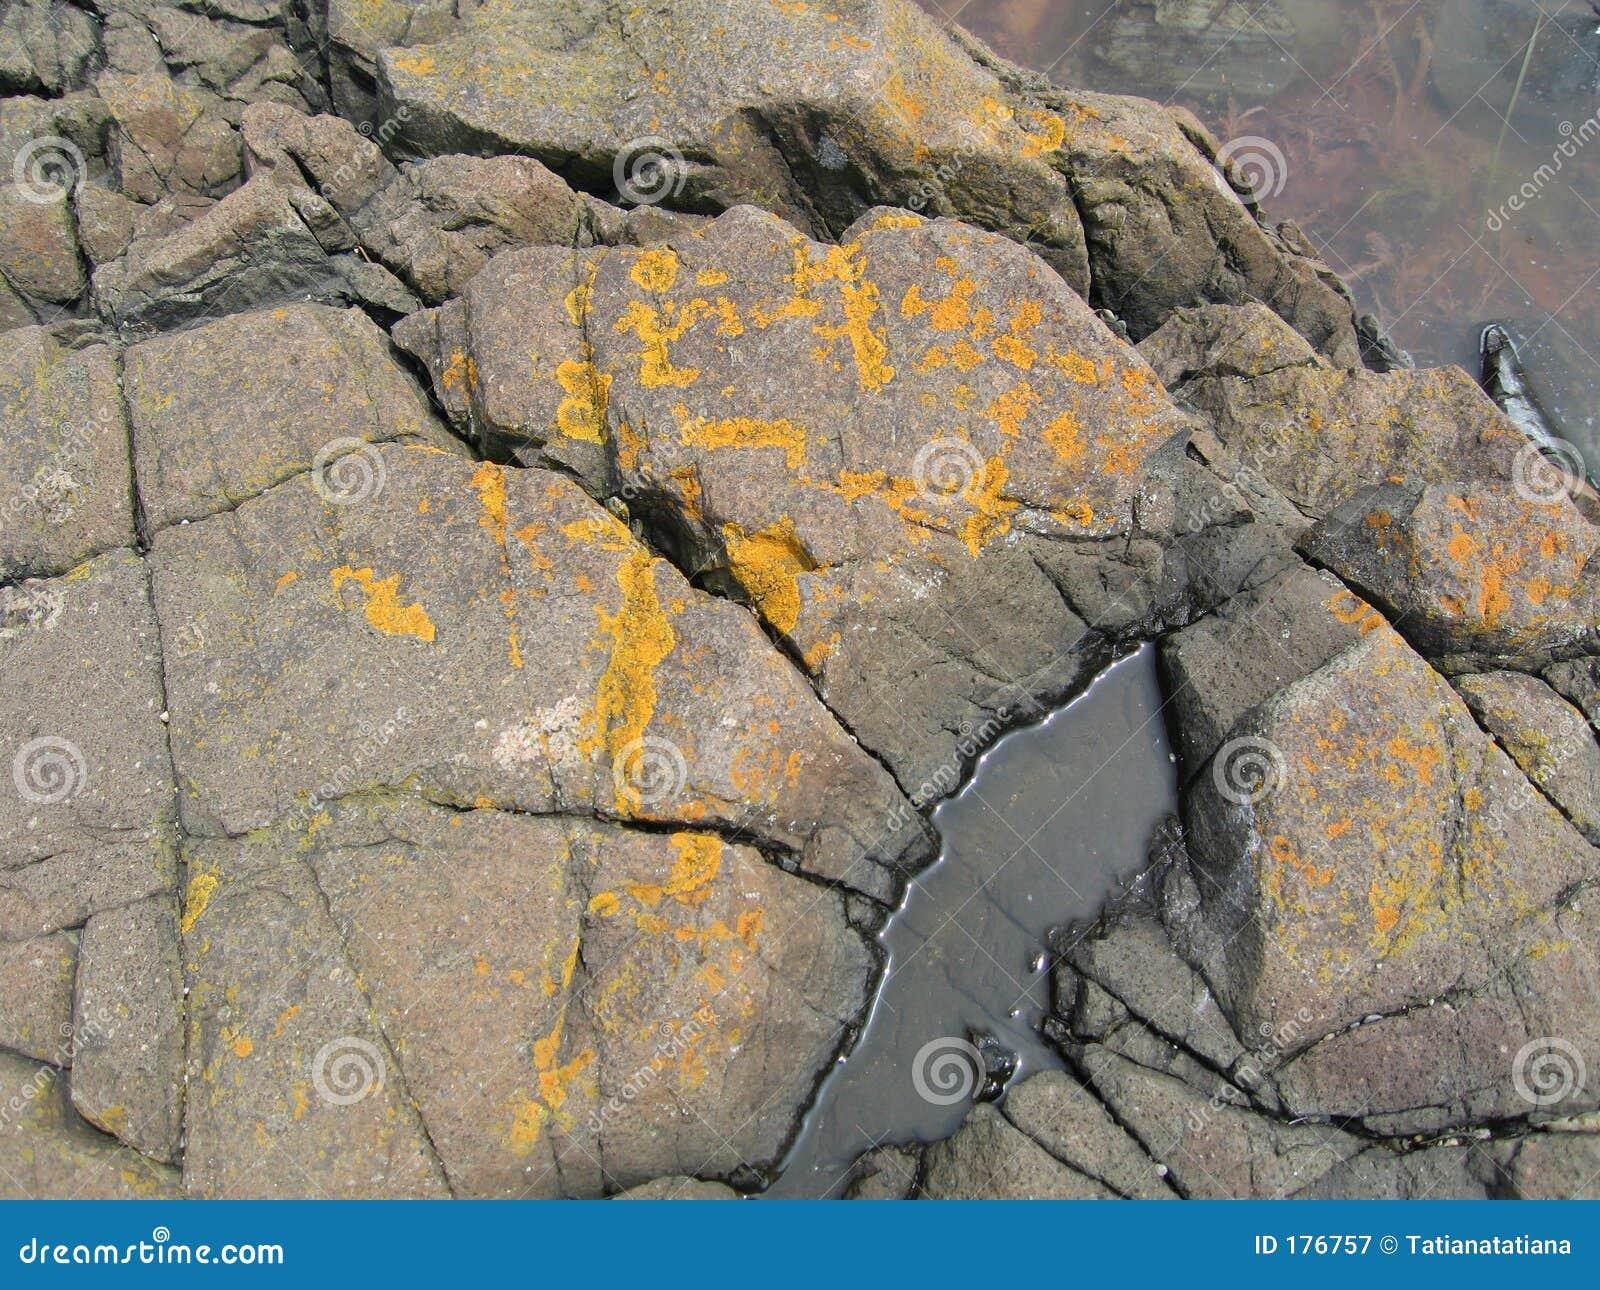 Svamp rocks